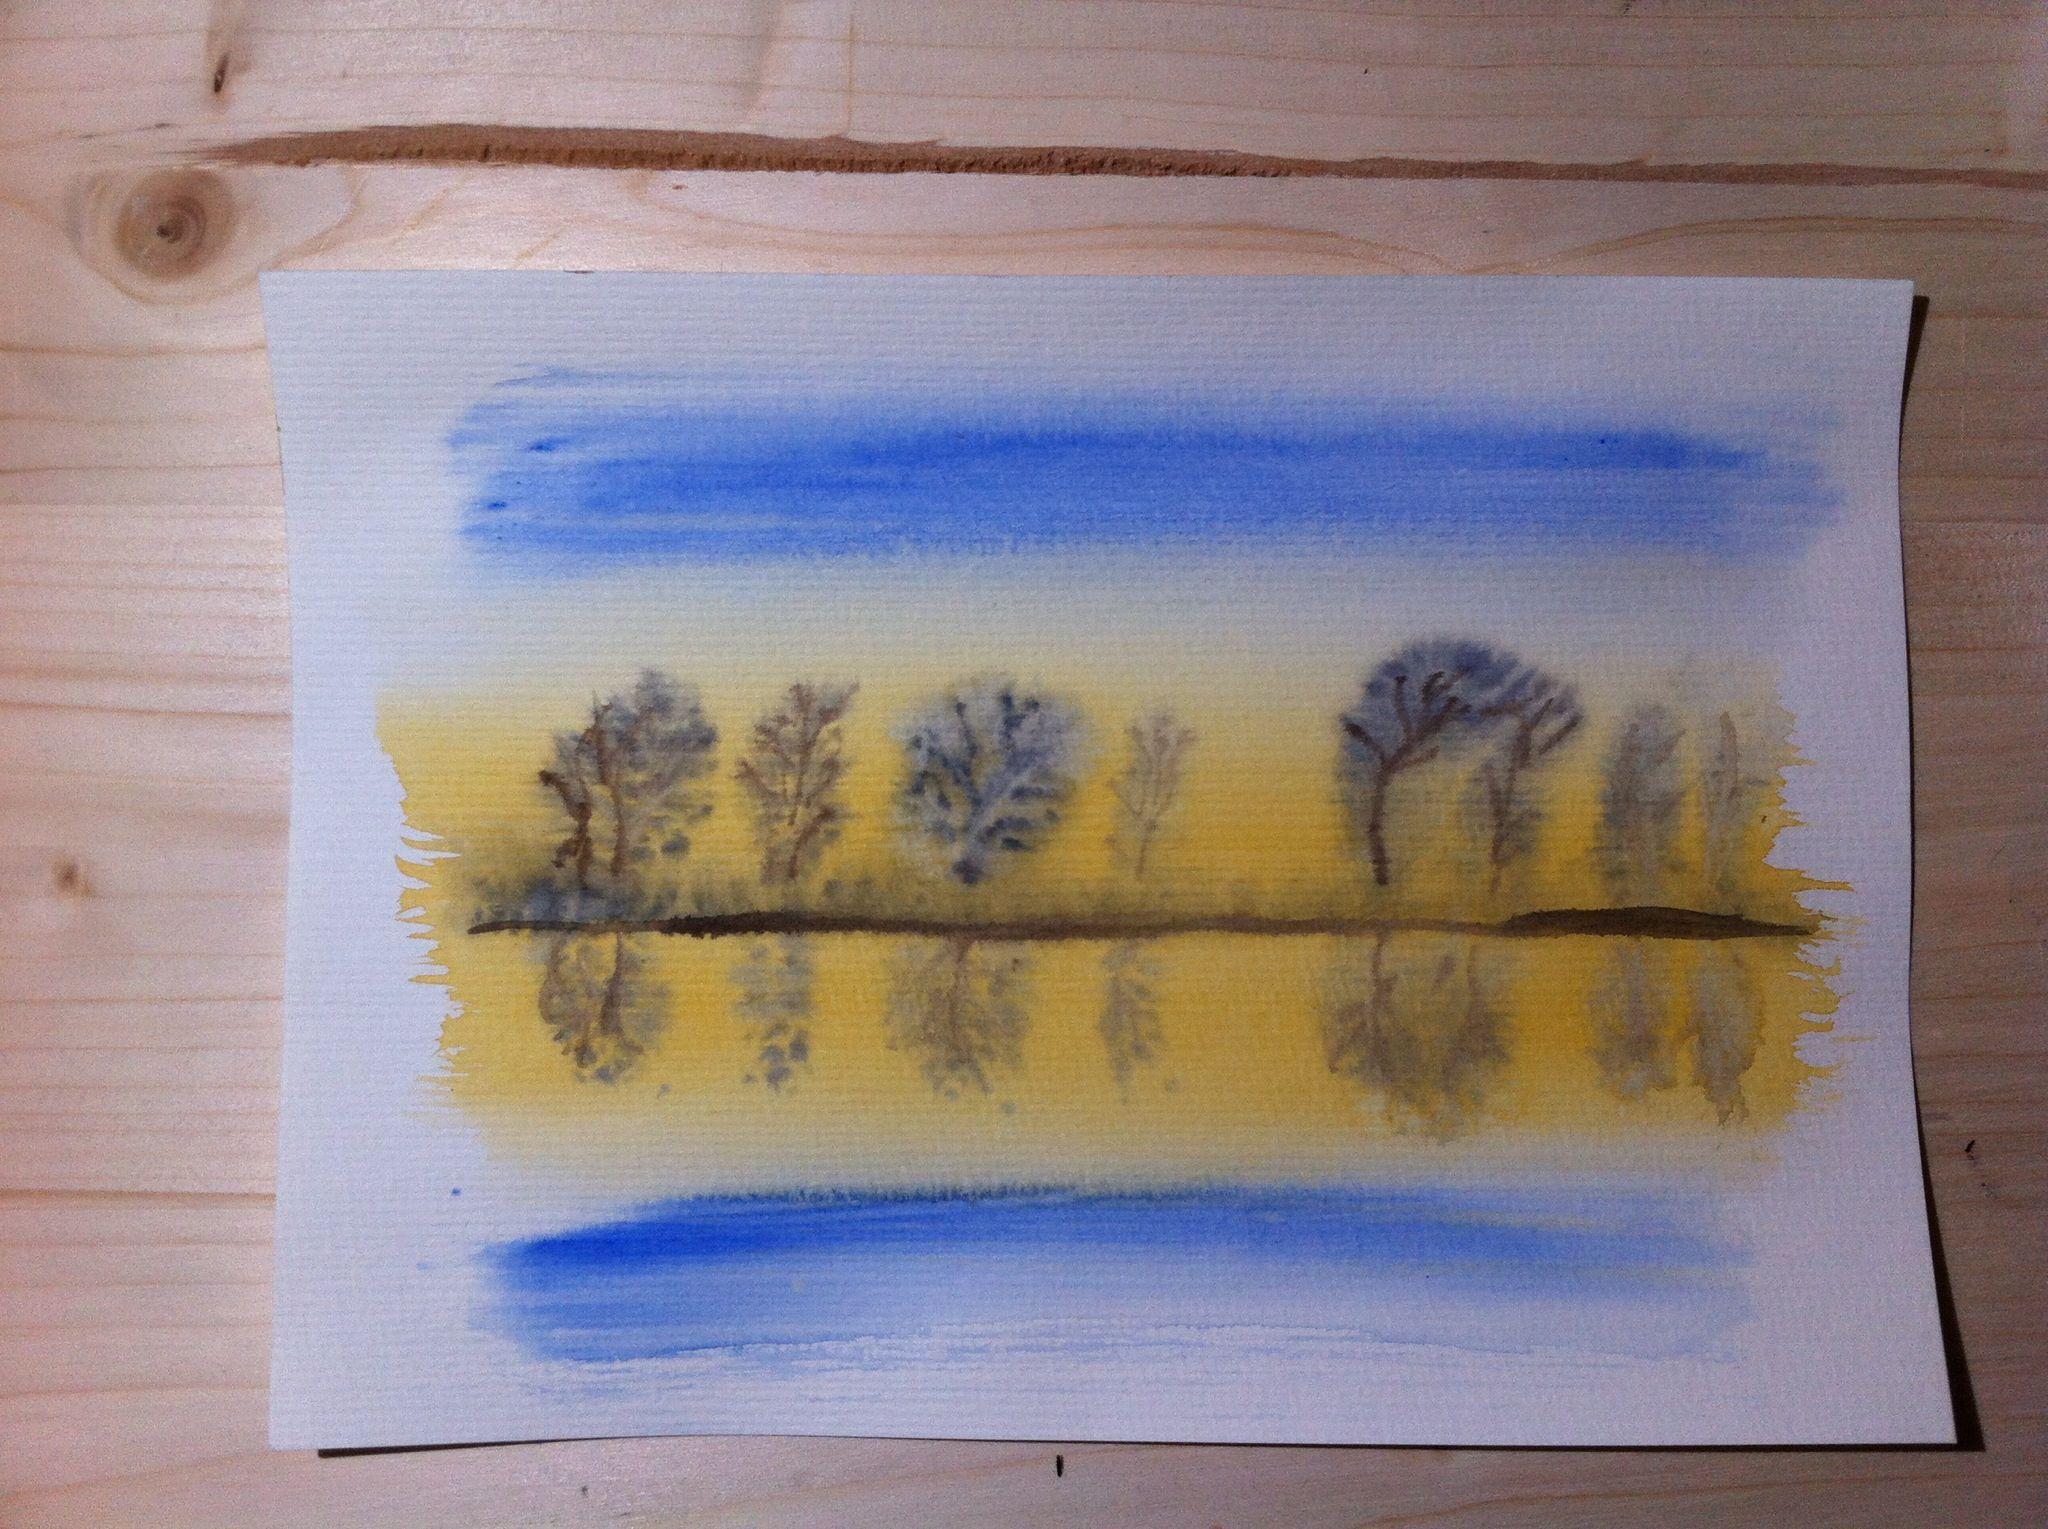 Aquarell-Skizze - am Fluß